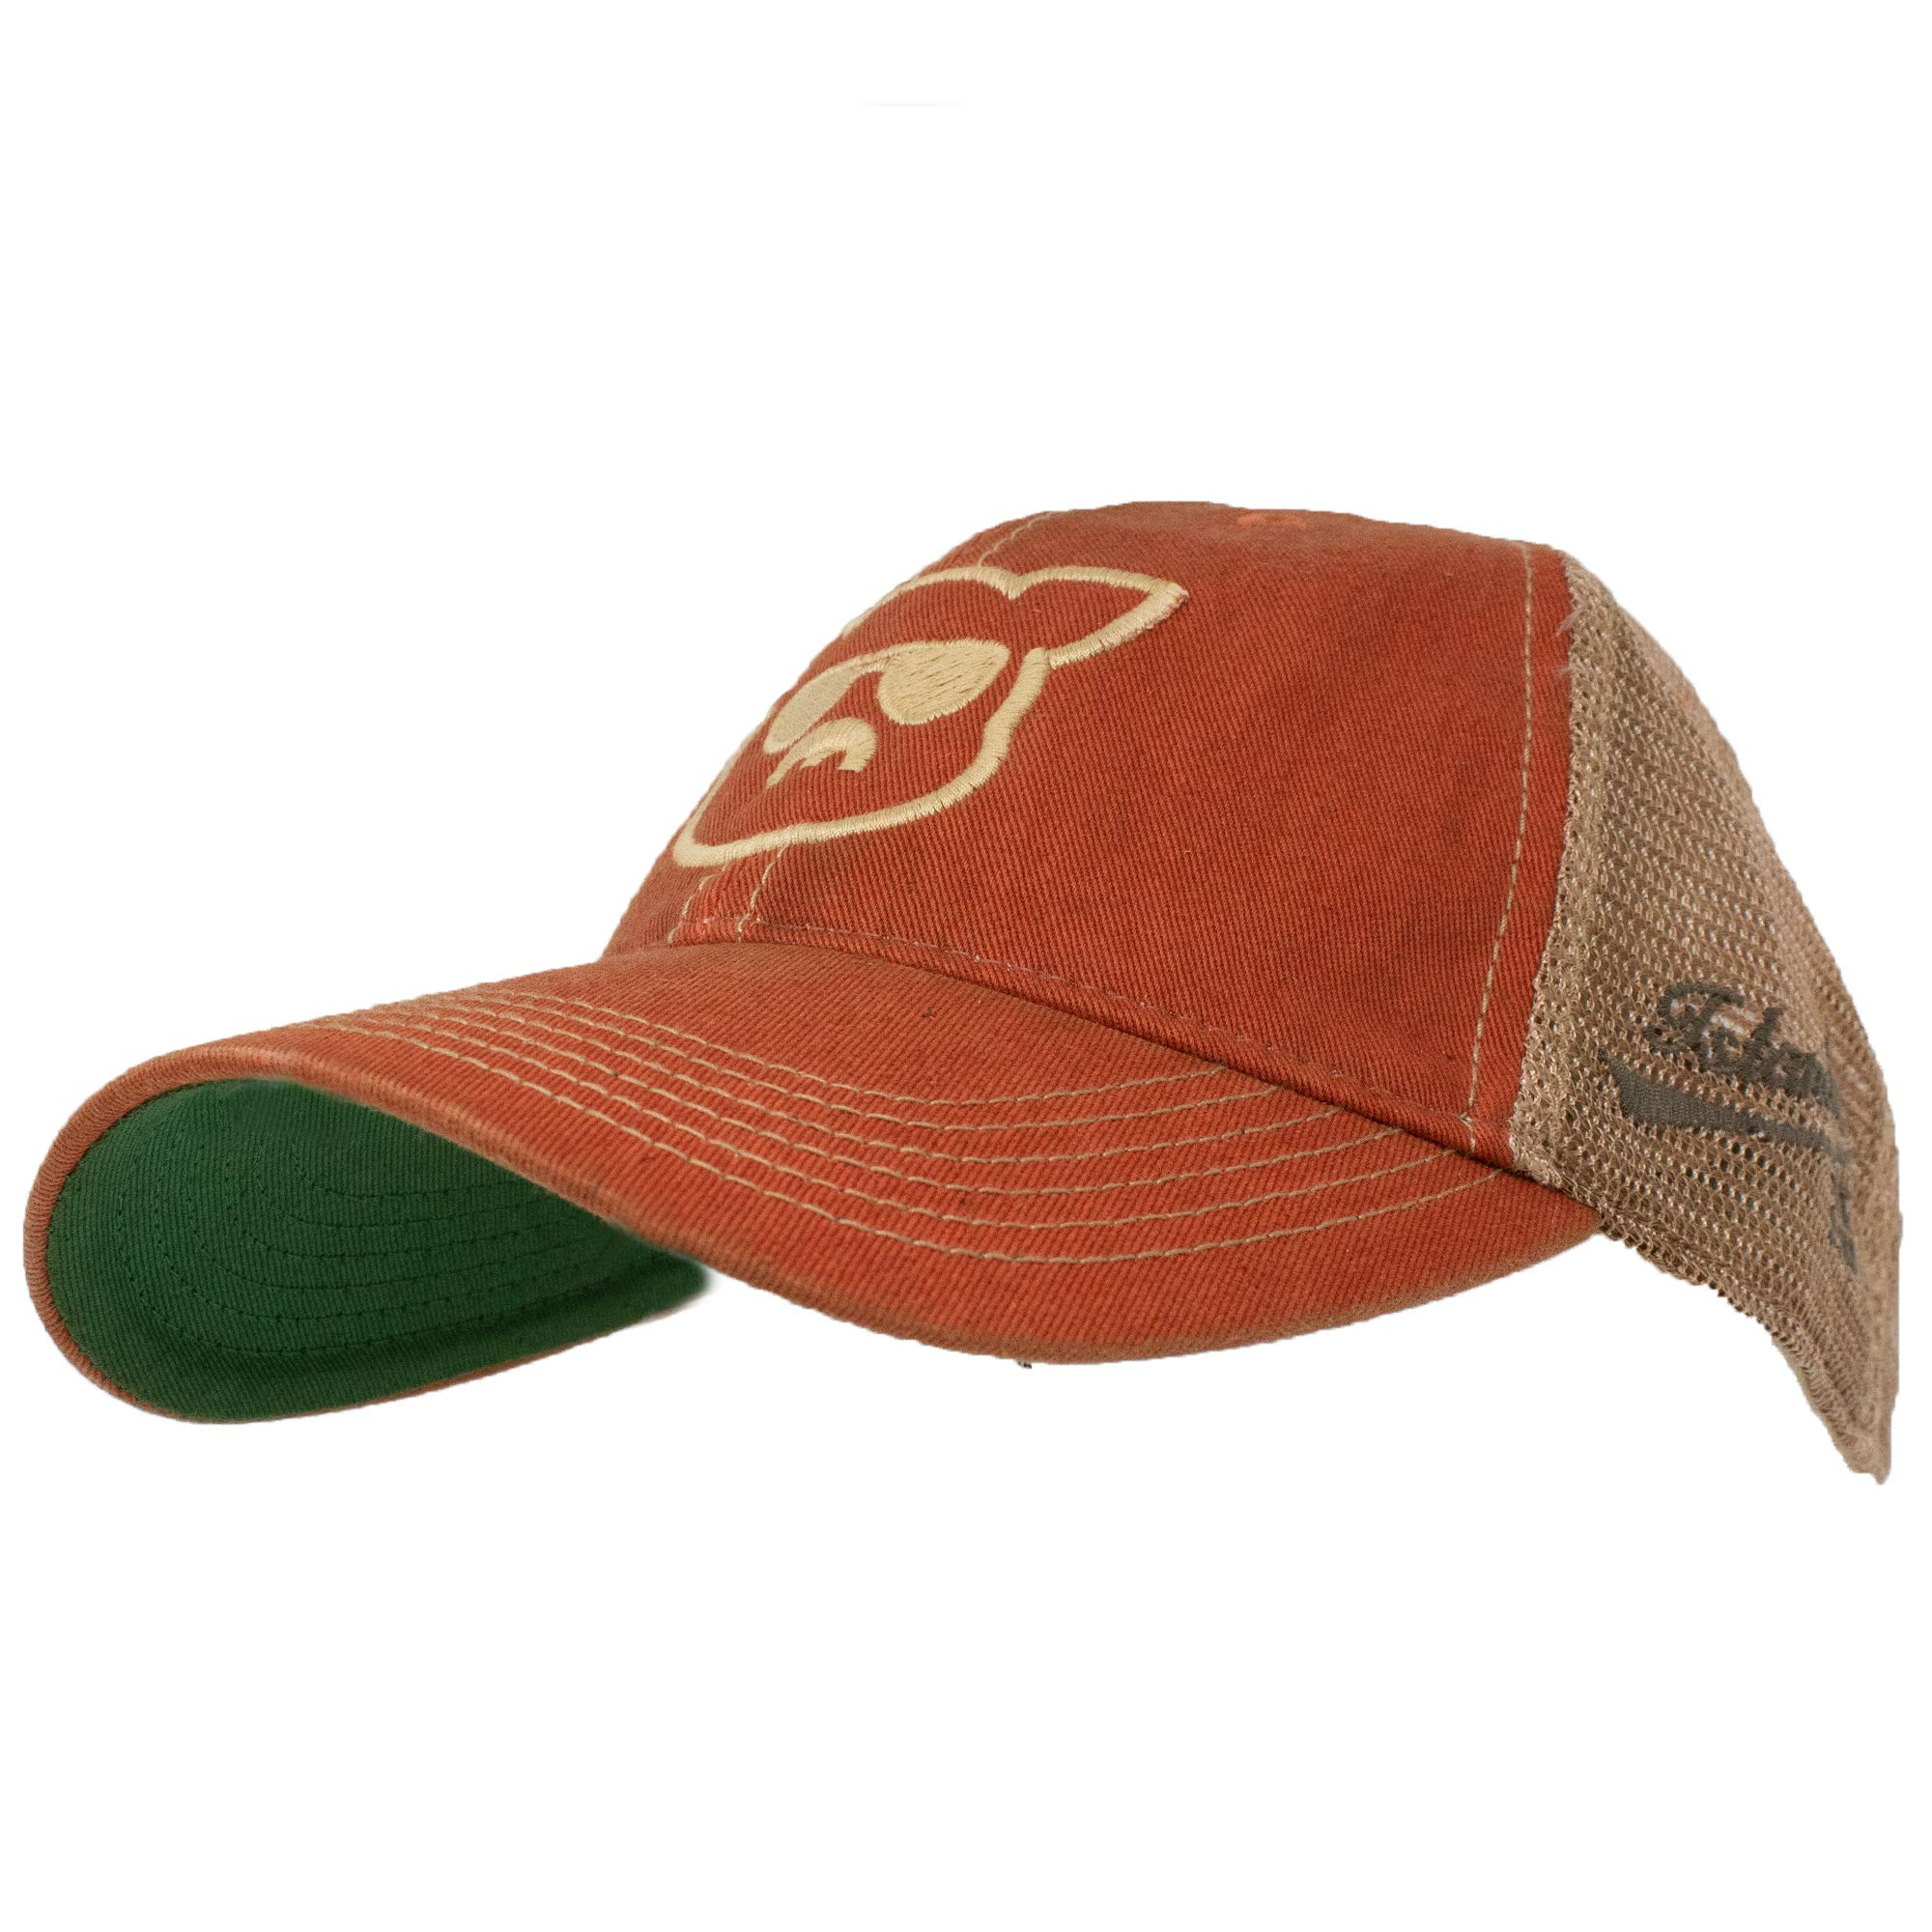 29448c86ea2a5f Islanders Pig Face Trucker Hat Mesh Snapback Vintage Feel, Orange, One Size